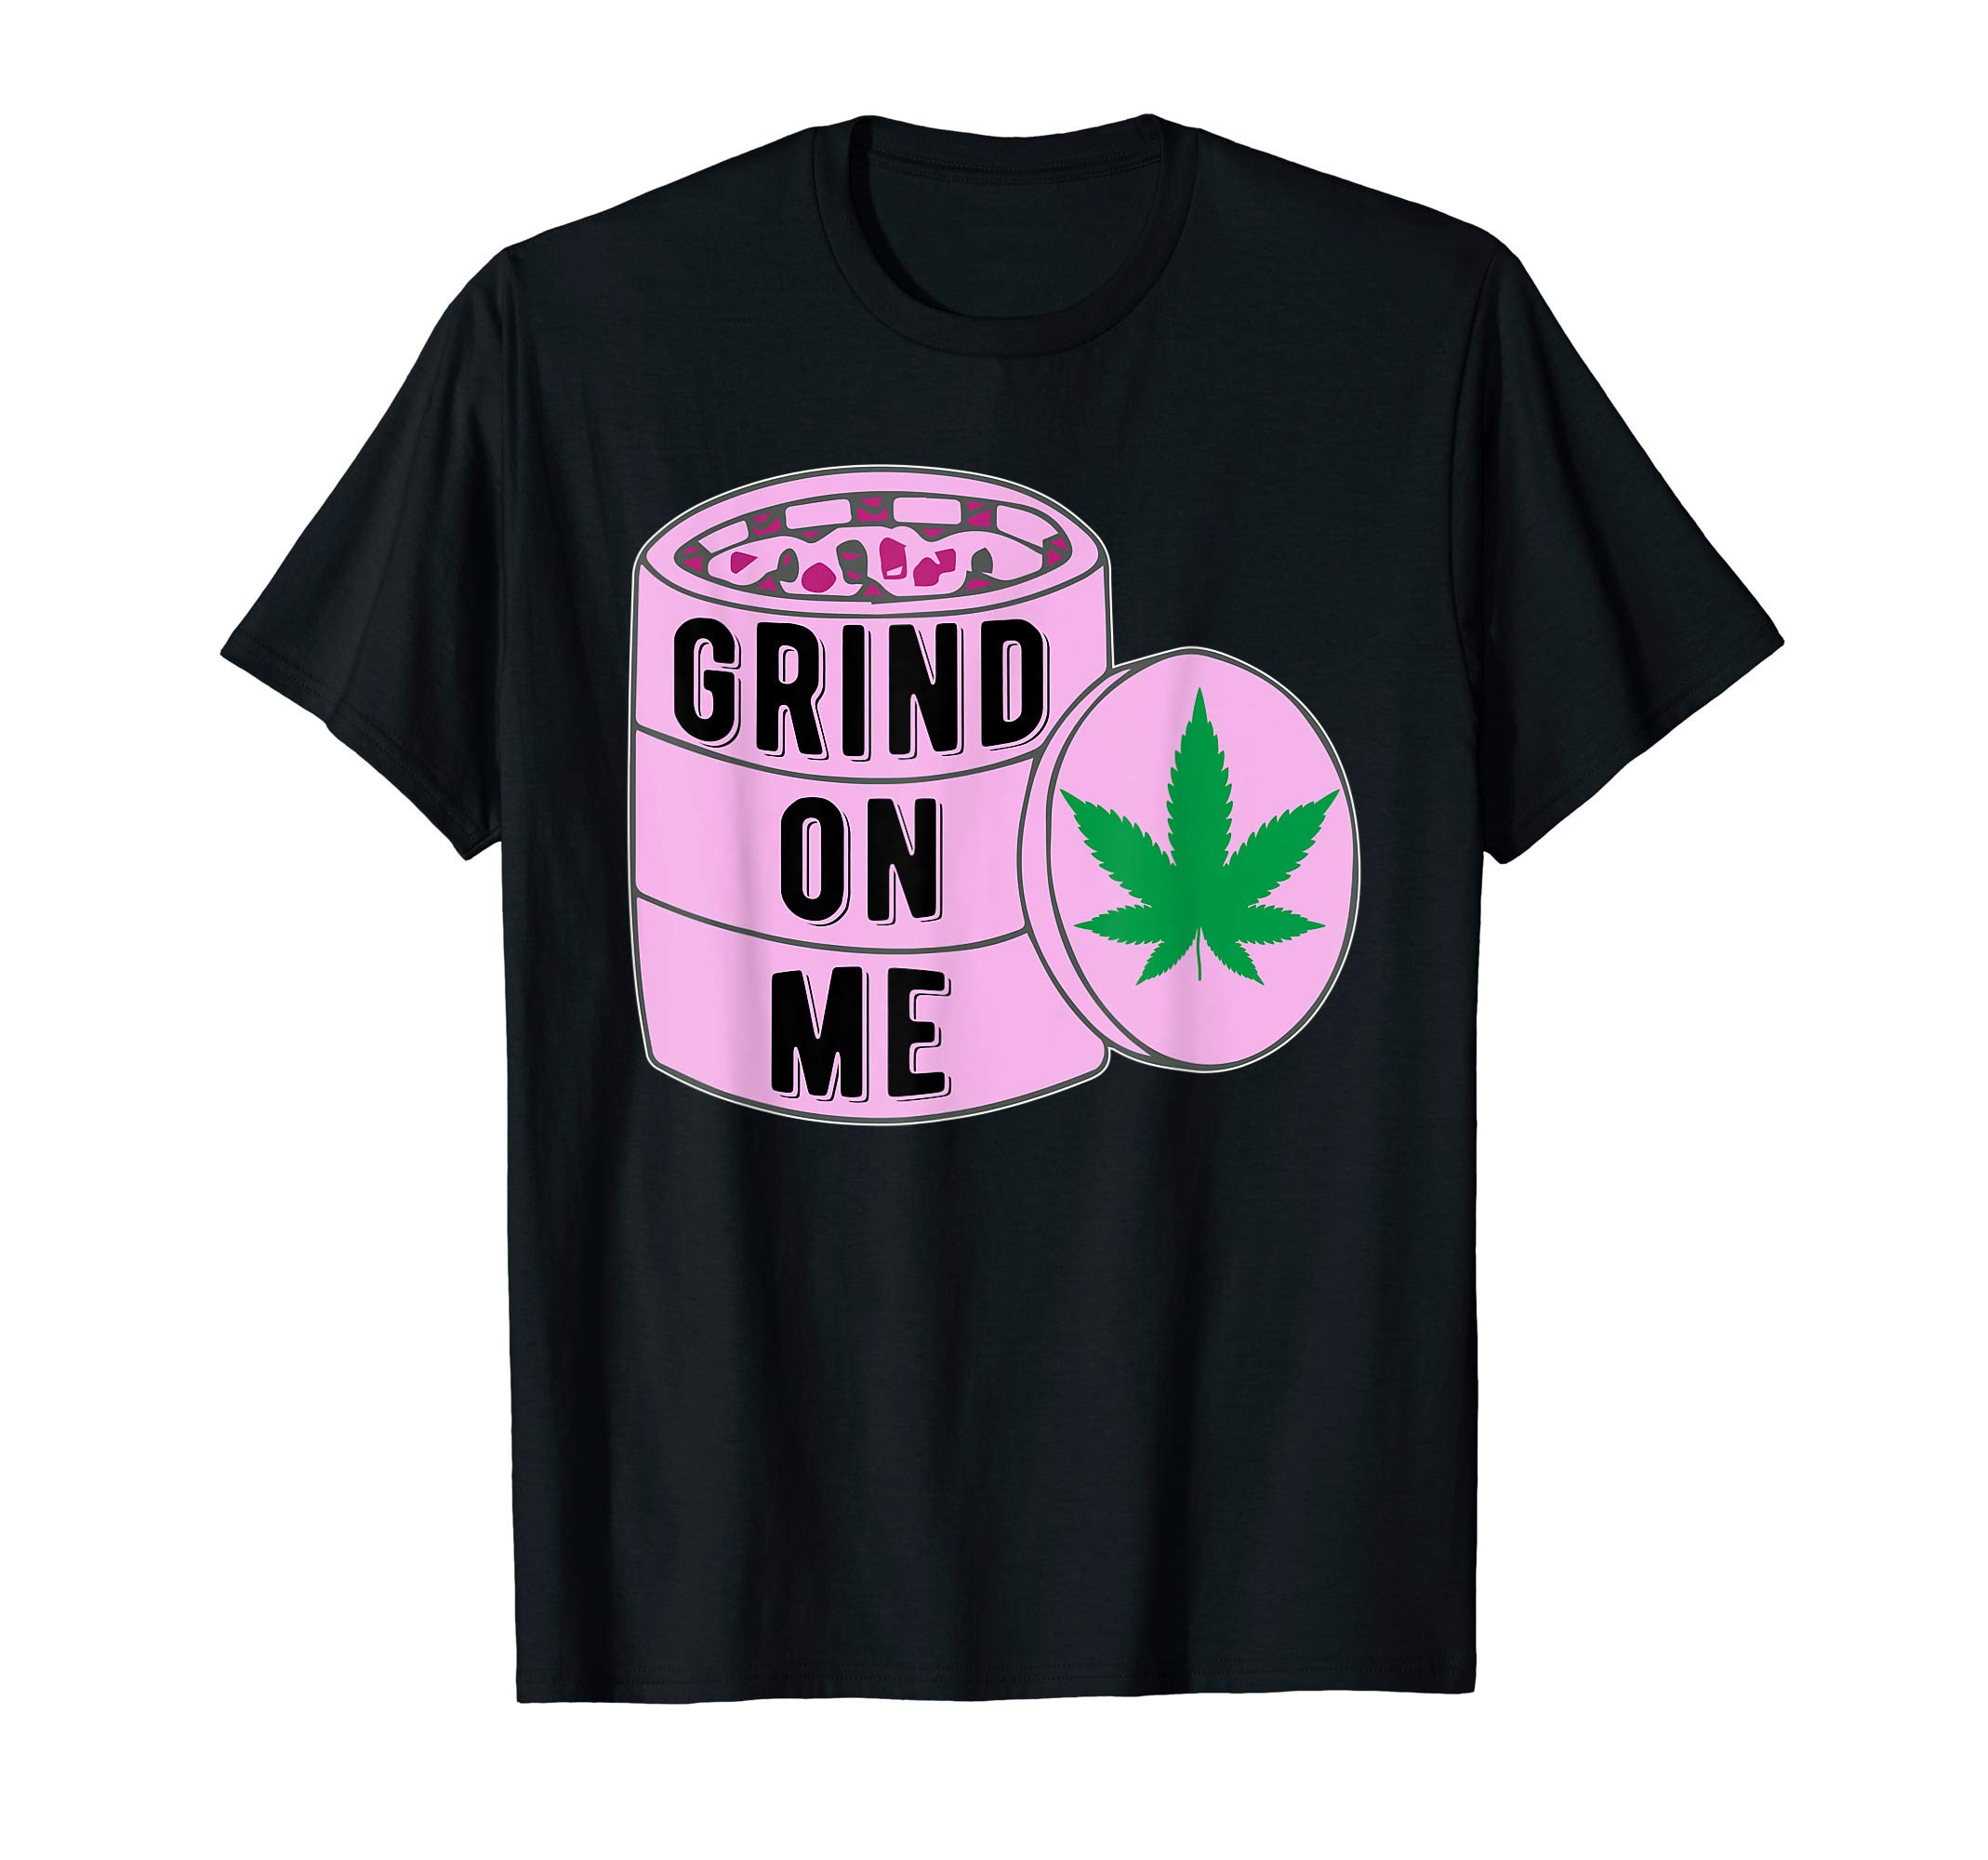 Grind On Me | Marijuana Cannabis 420 Weed/Pot Stoner Ganja T-Shirt